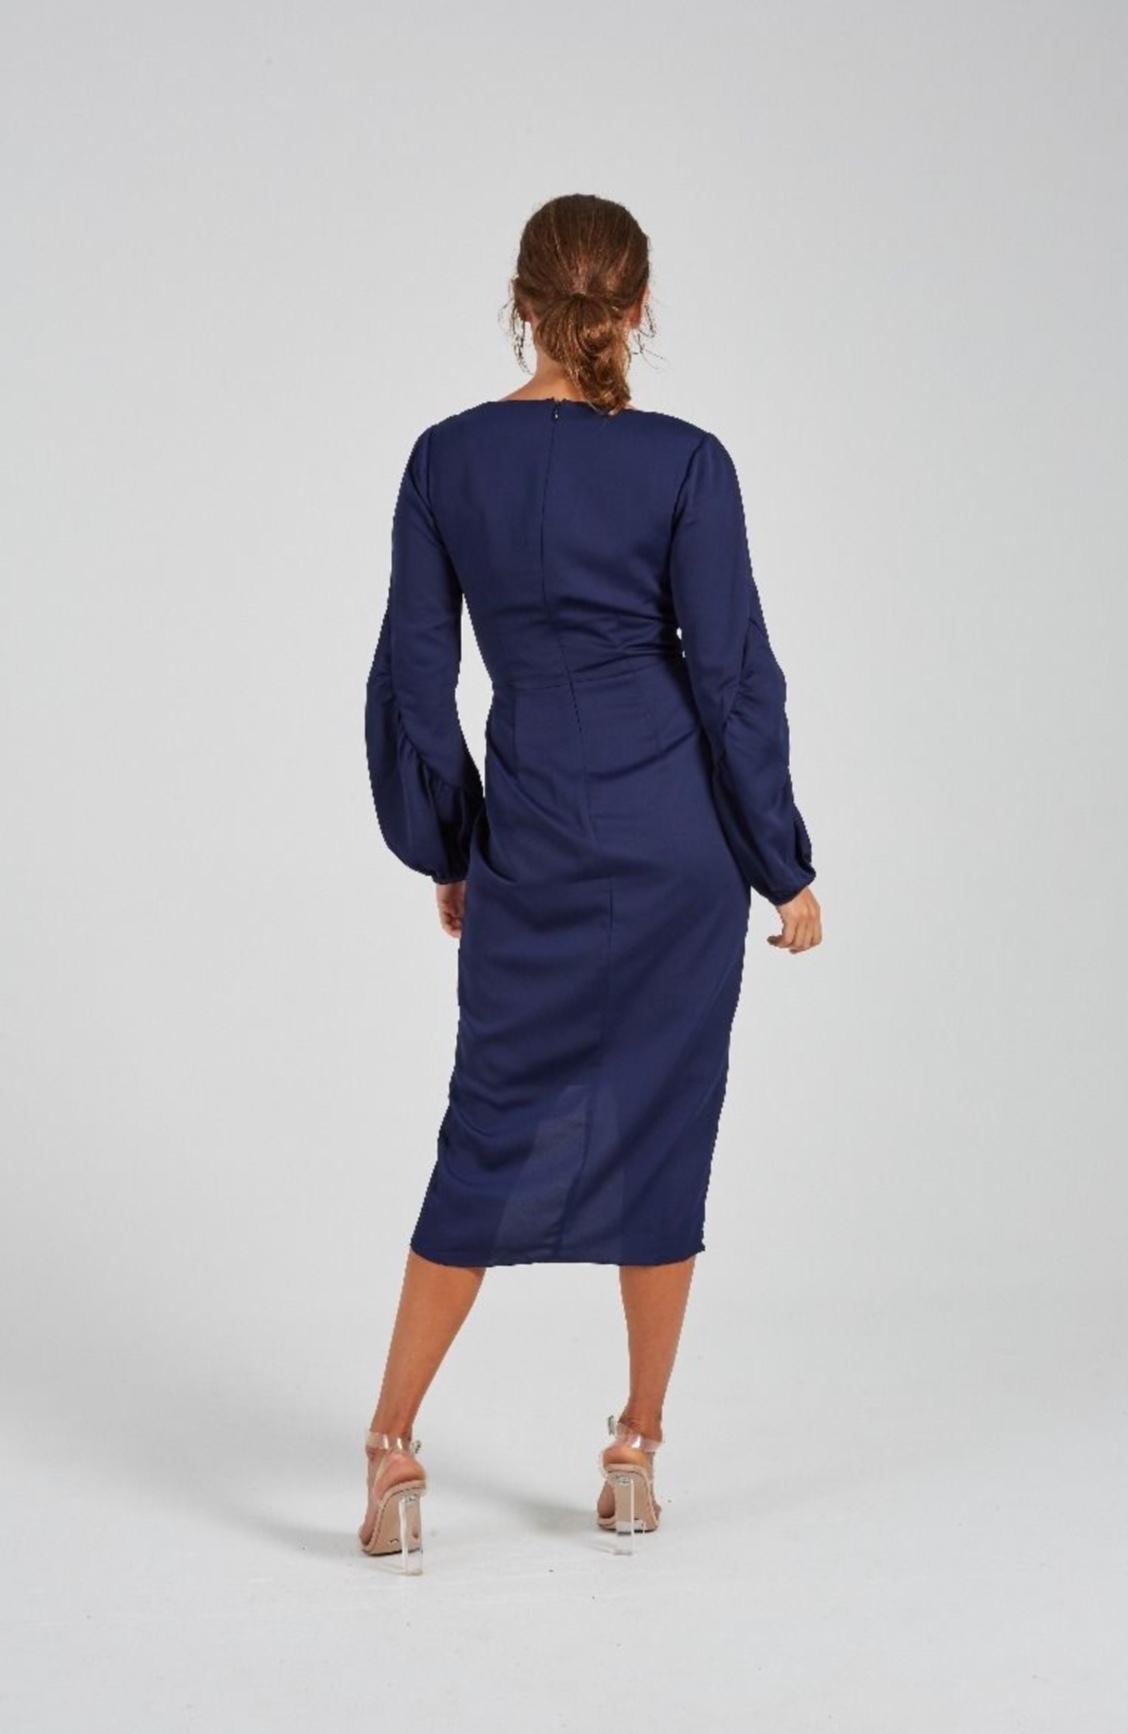 e2300d3dcee ... COOPER ST  Florence Long Sleeve Drape Dress  Size 16 ...